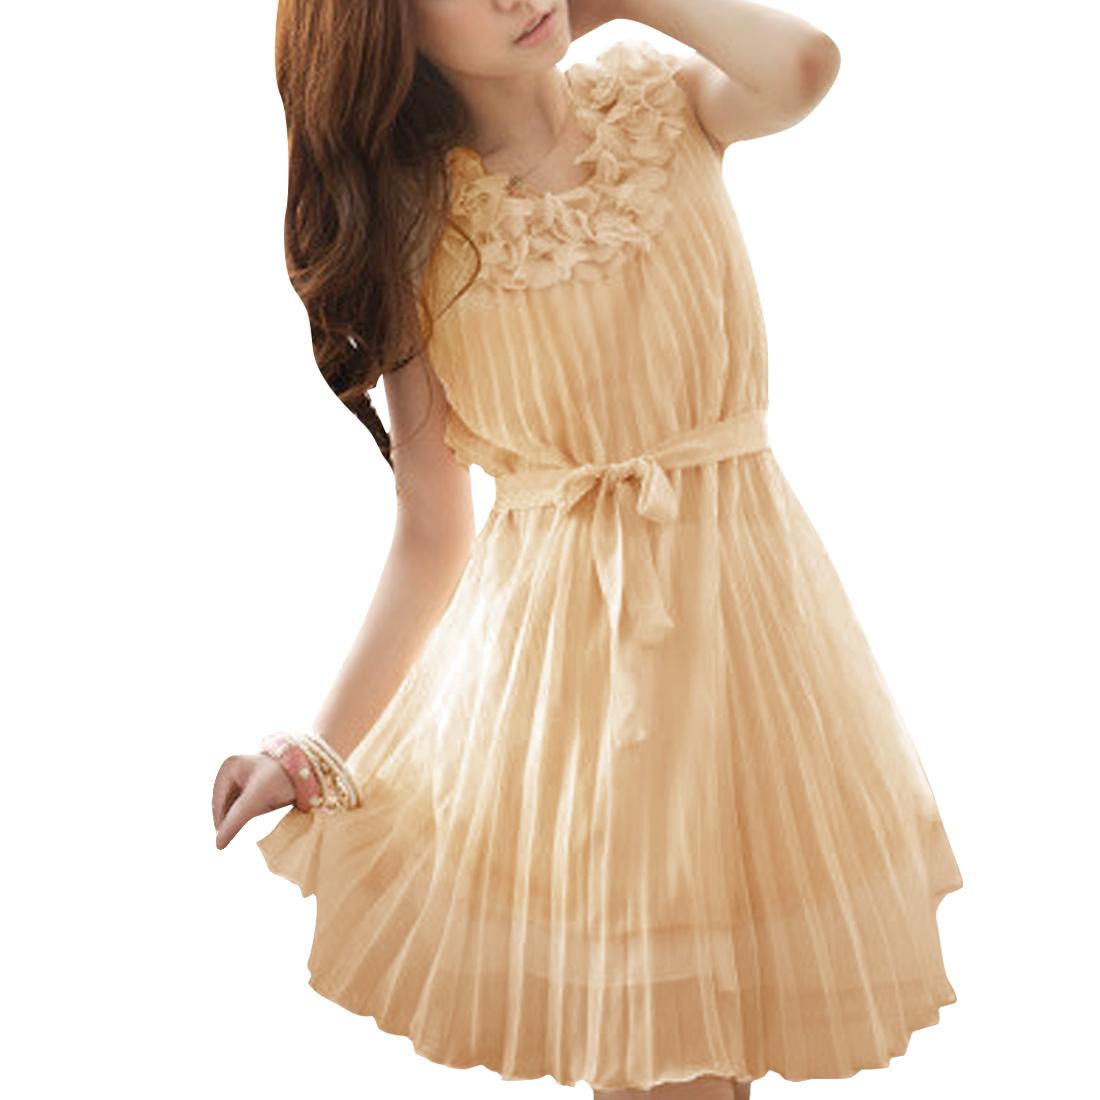 Ladies Apricot Sleeveless Pleated Round Neck Casual Dress M